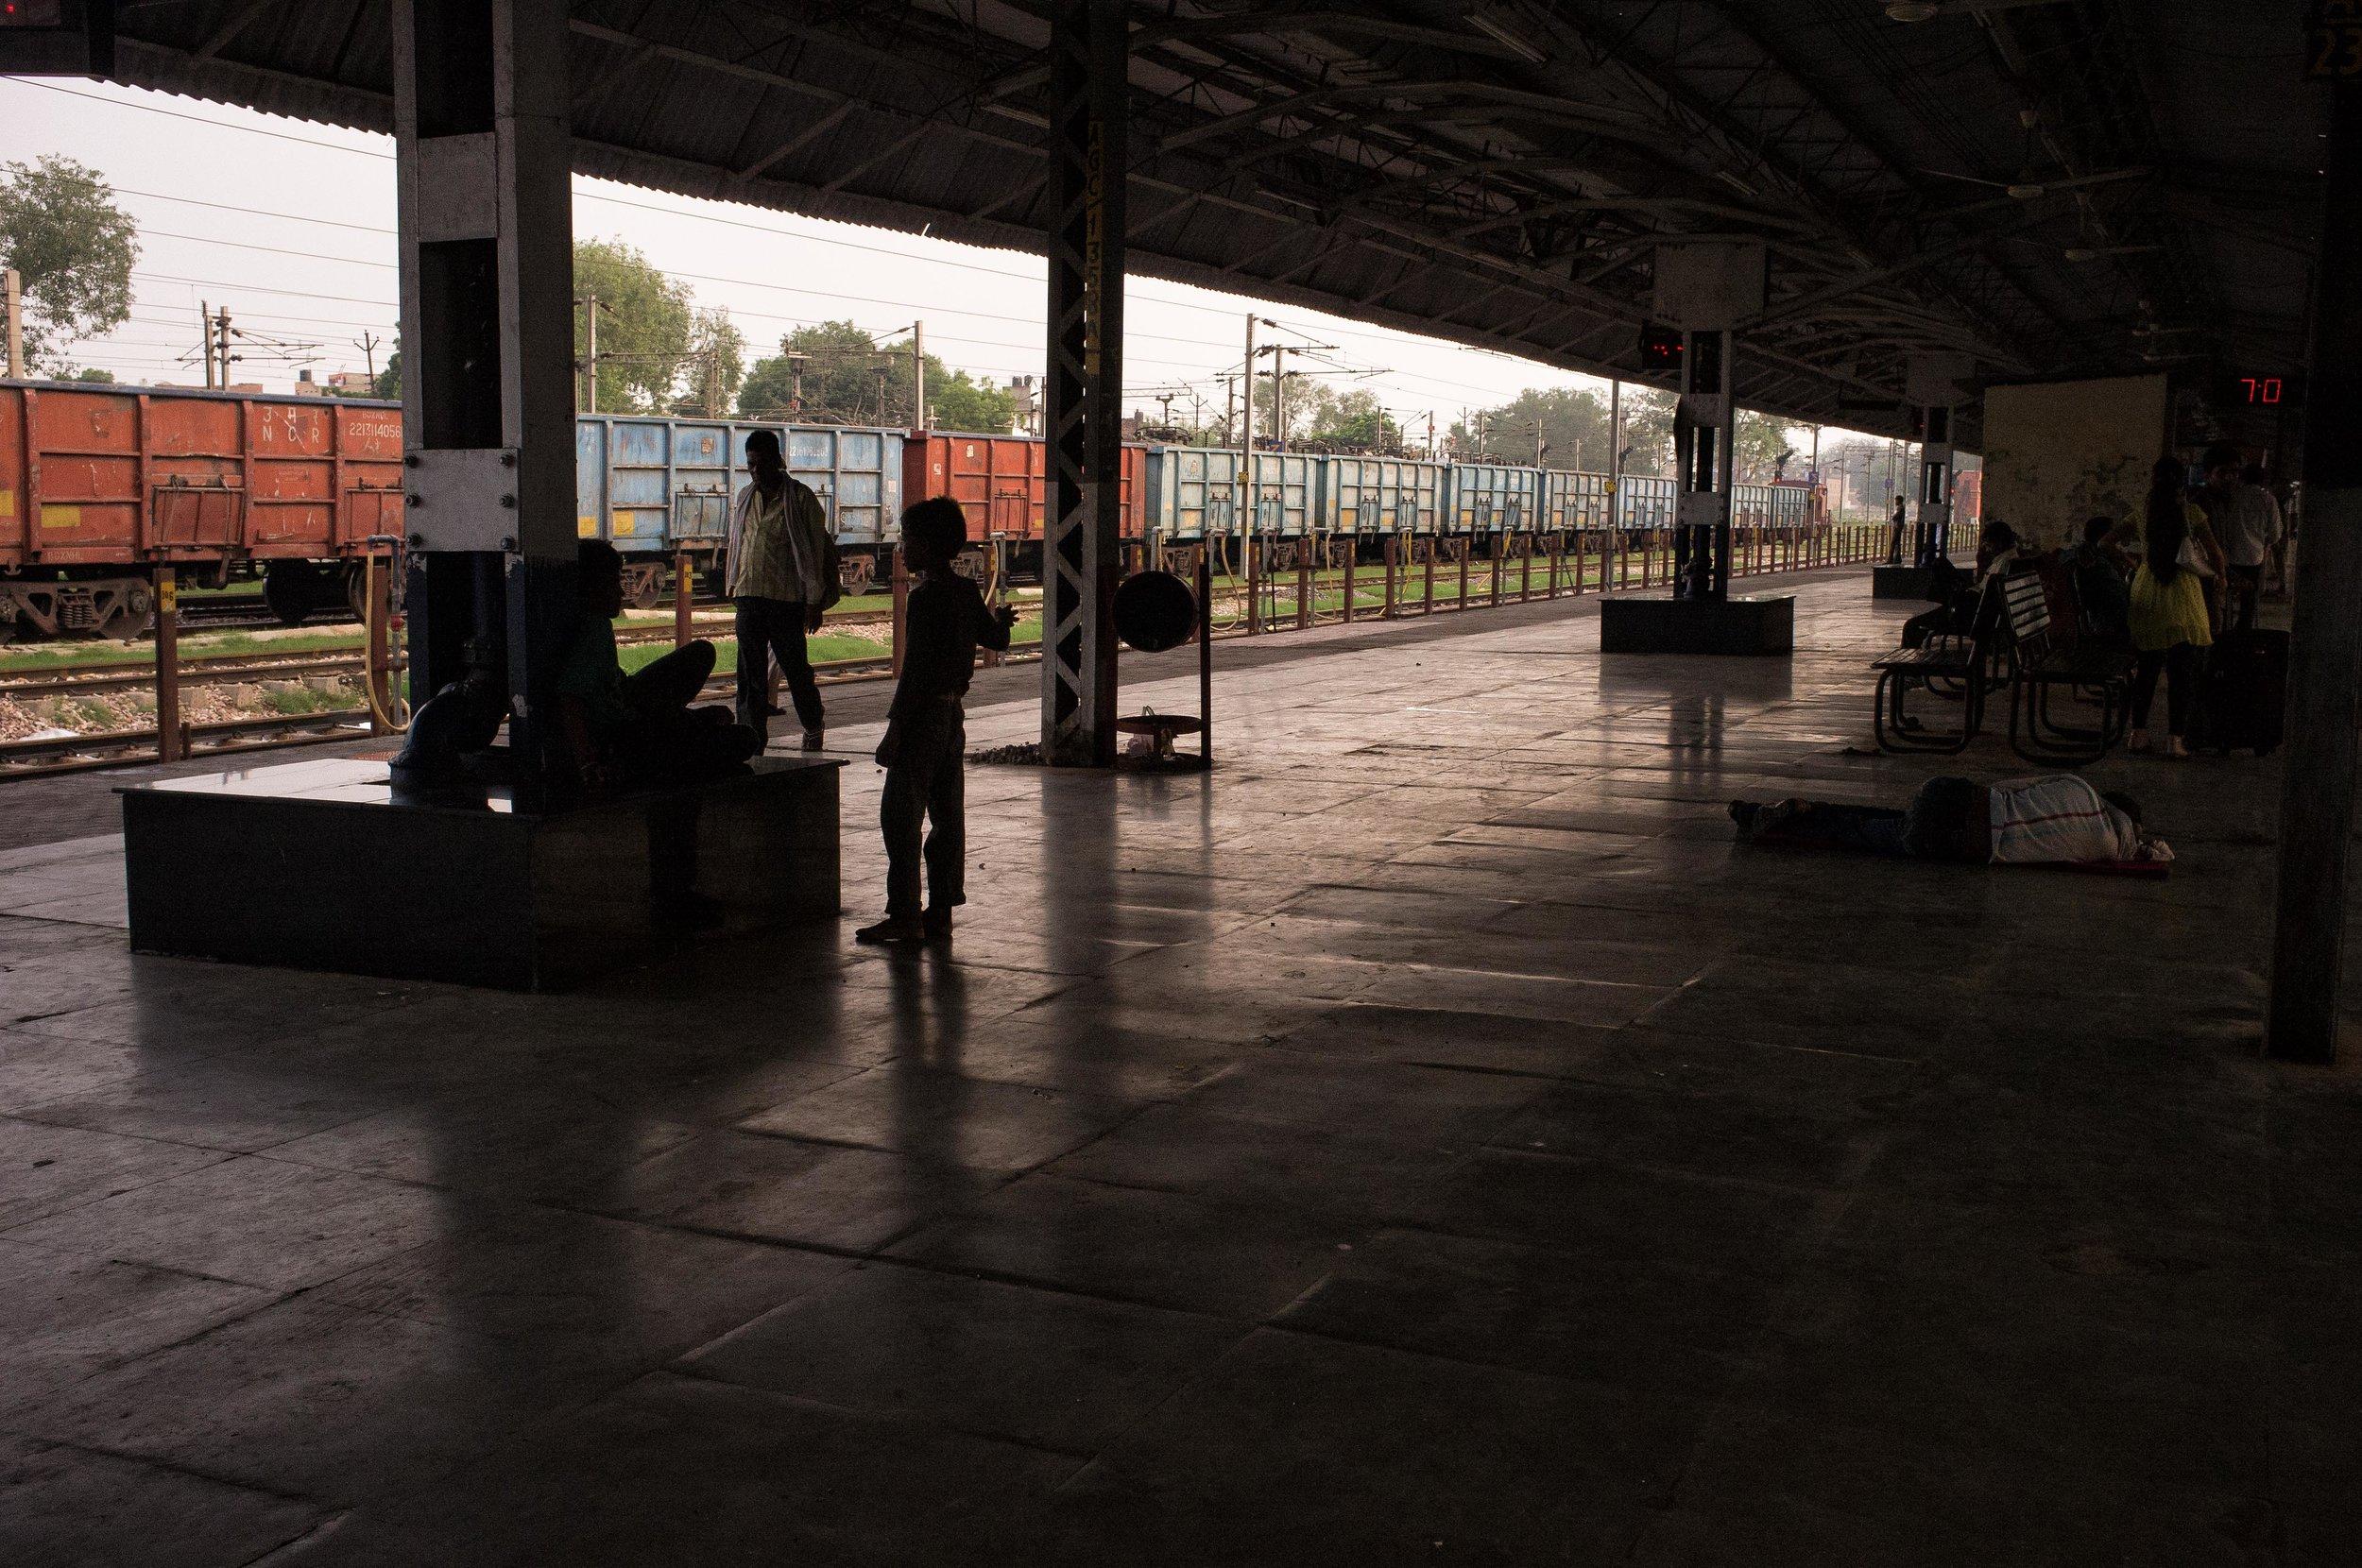 Train station, India, 2015